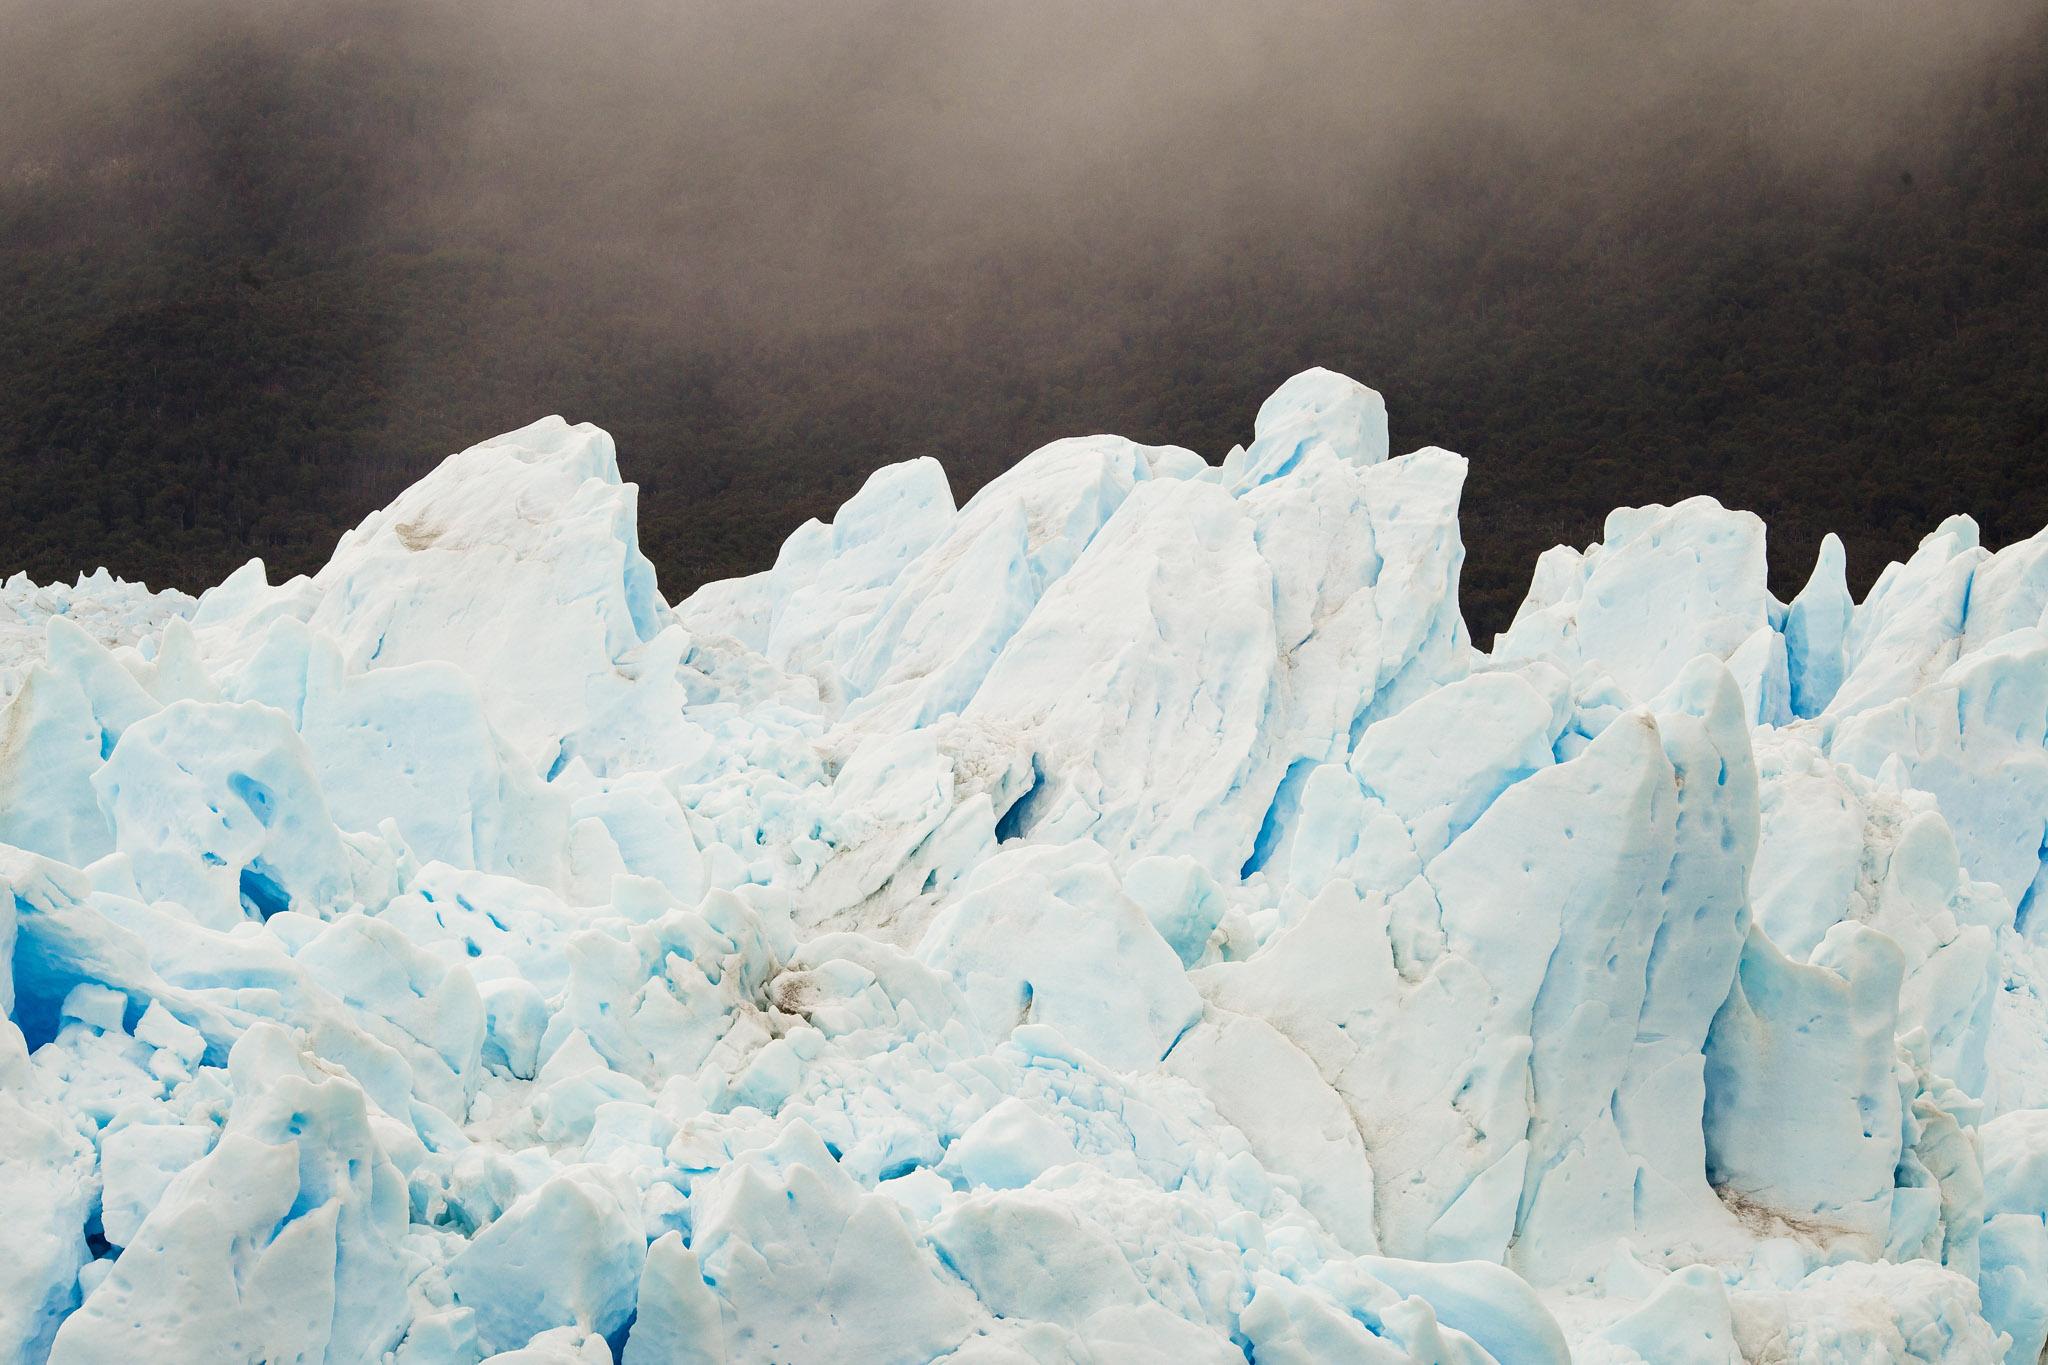 Wedding-Travellers-Overlanding-Destination-Wedding-Chile-Patagonia-Glacier-Perito-Moreno-ice-detail